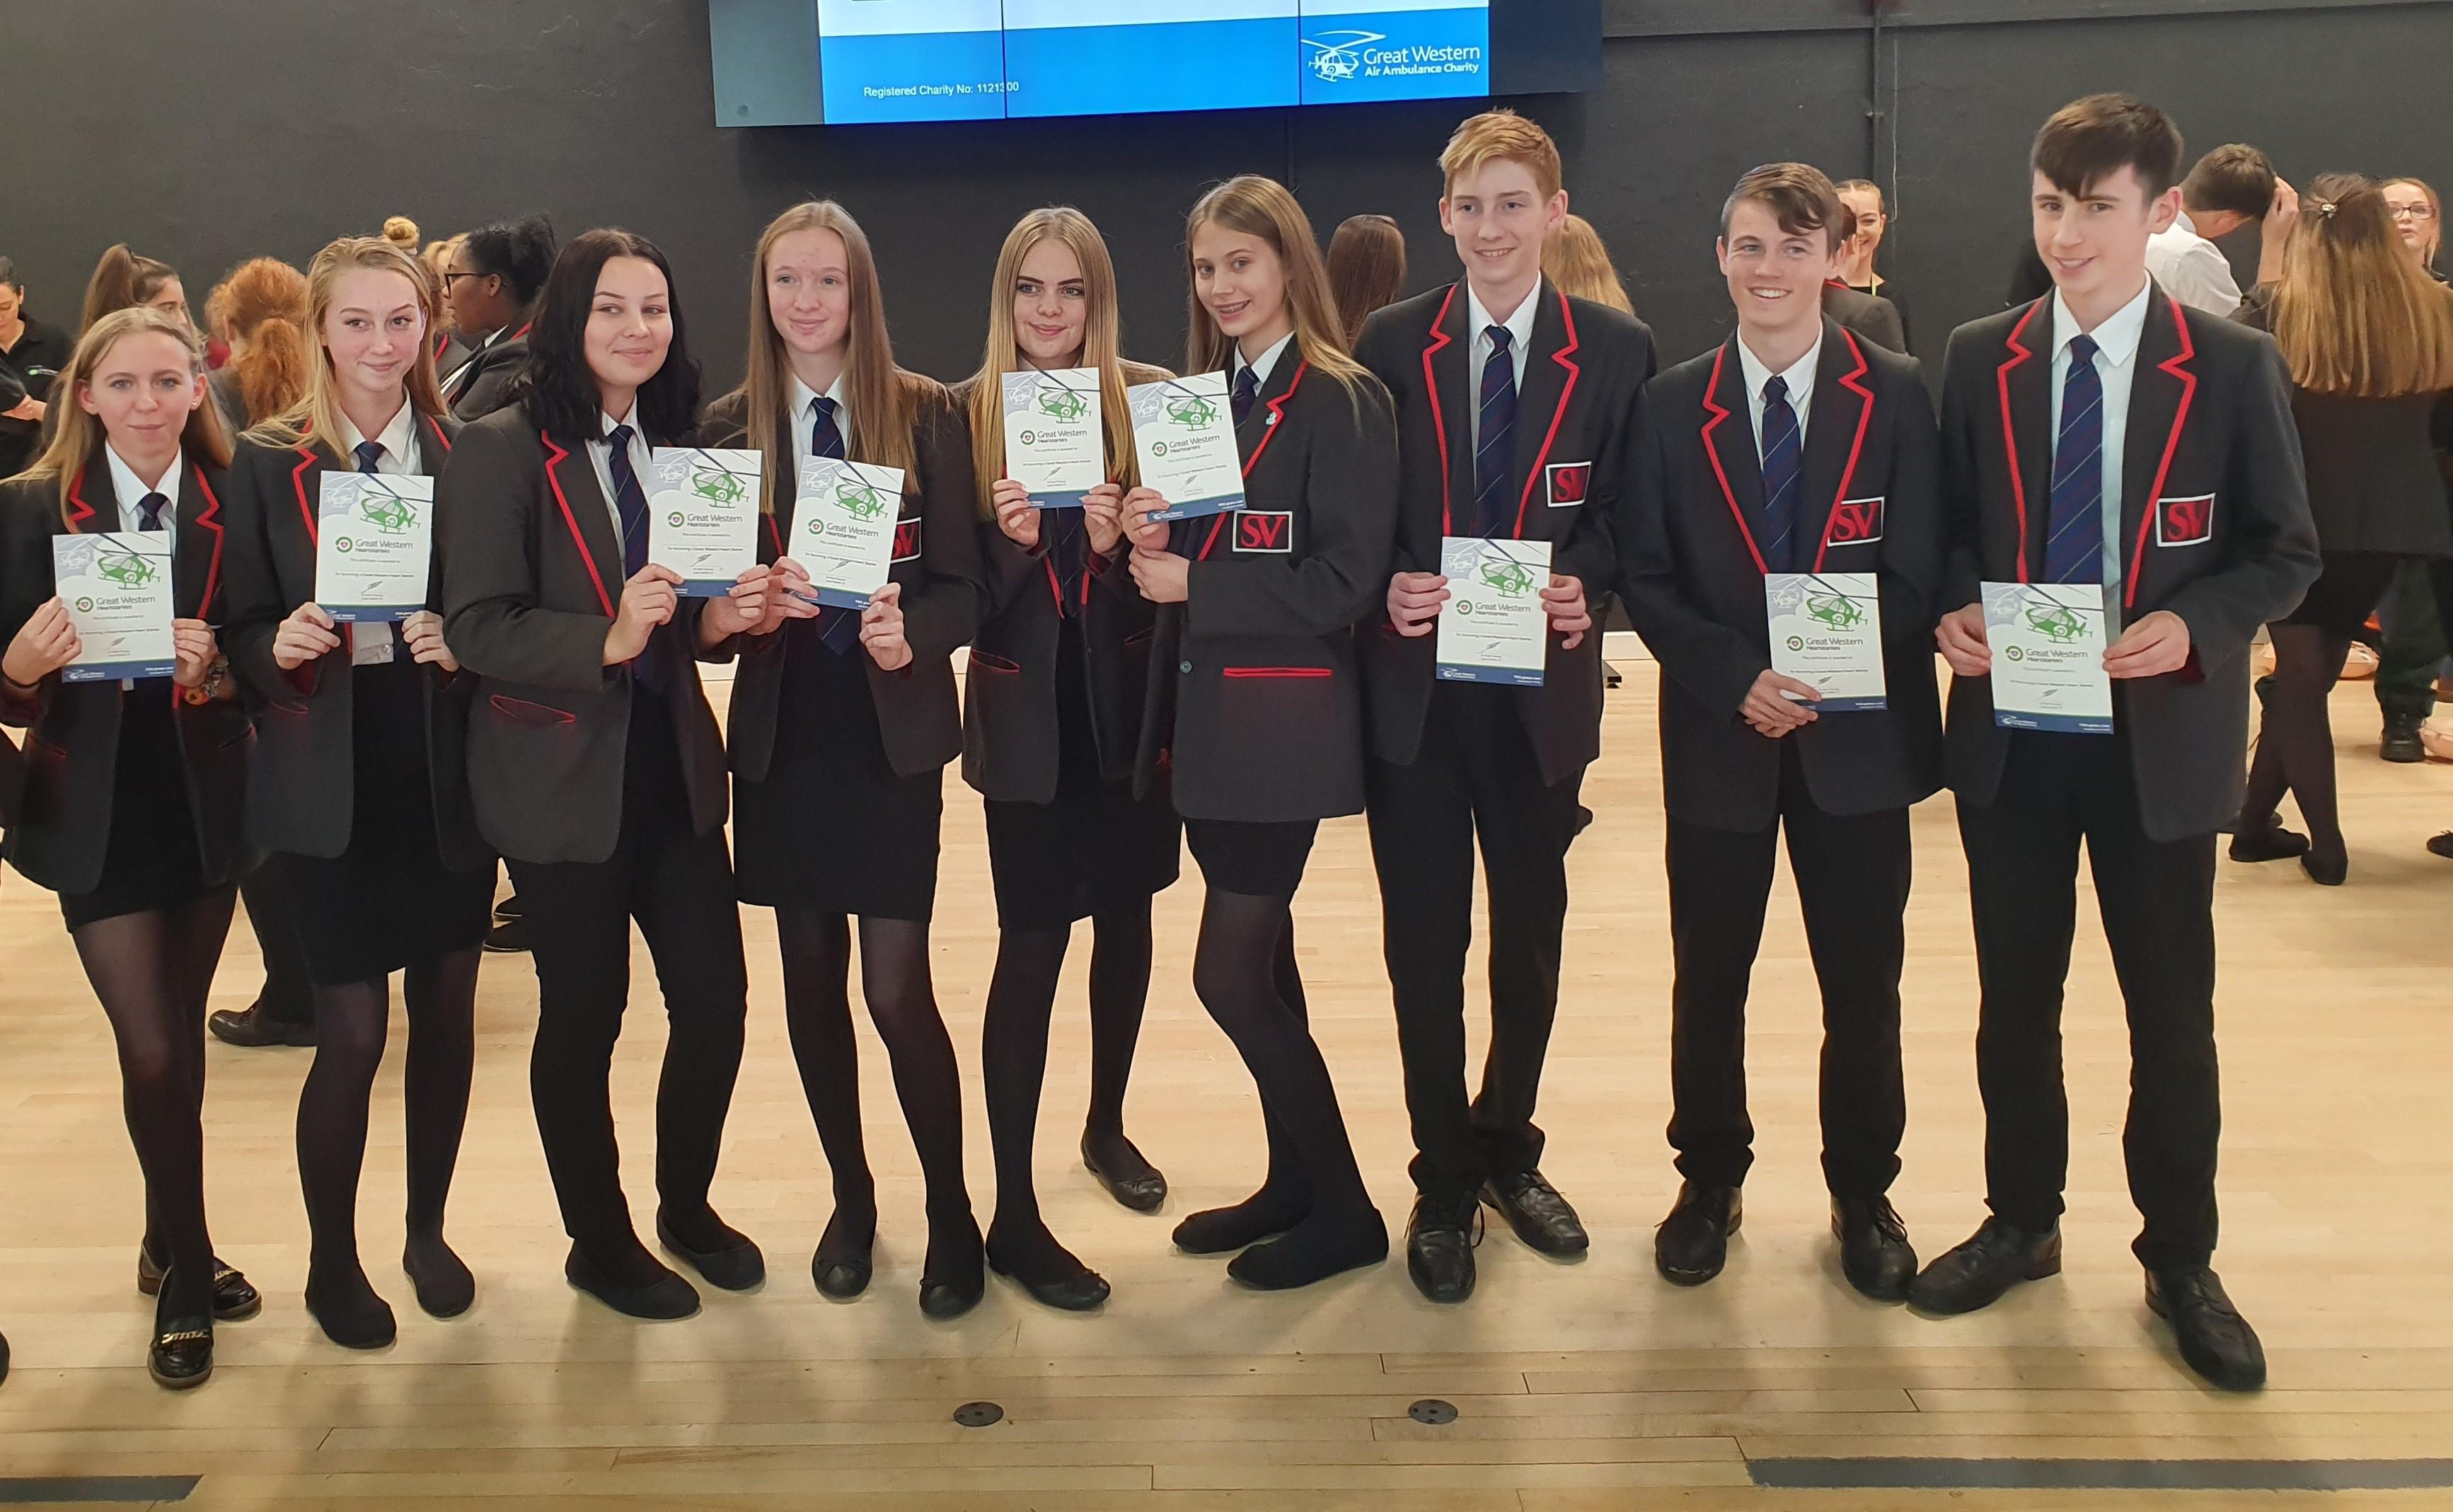 Pupils with their Heartstarter certificates